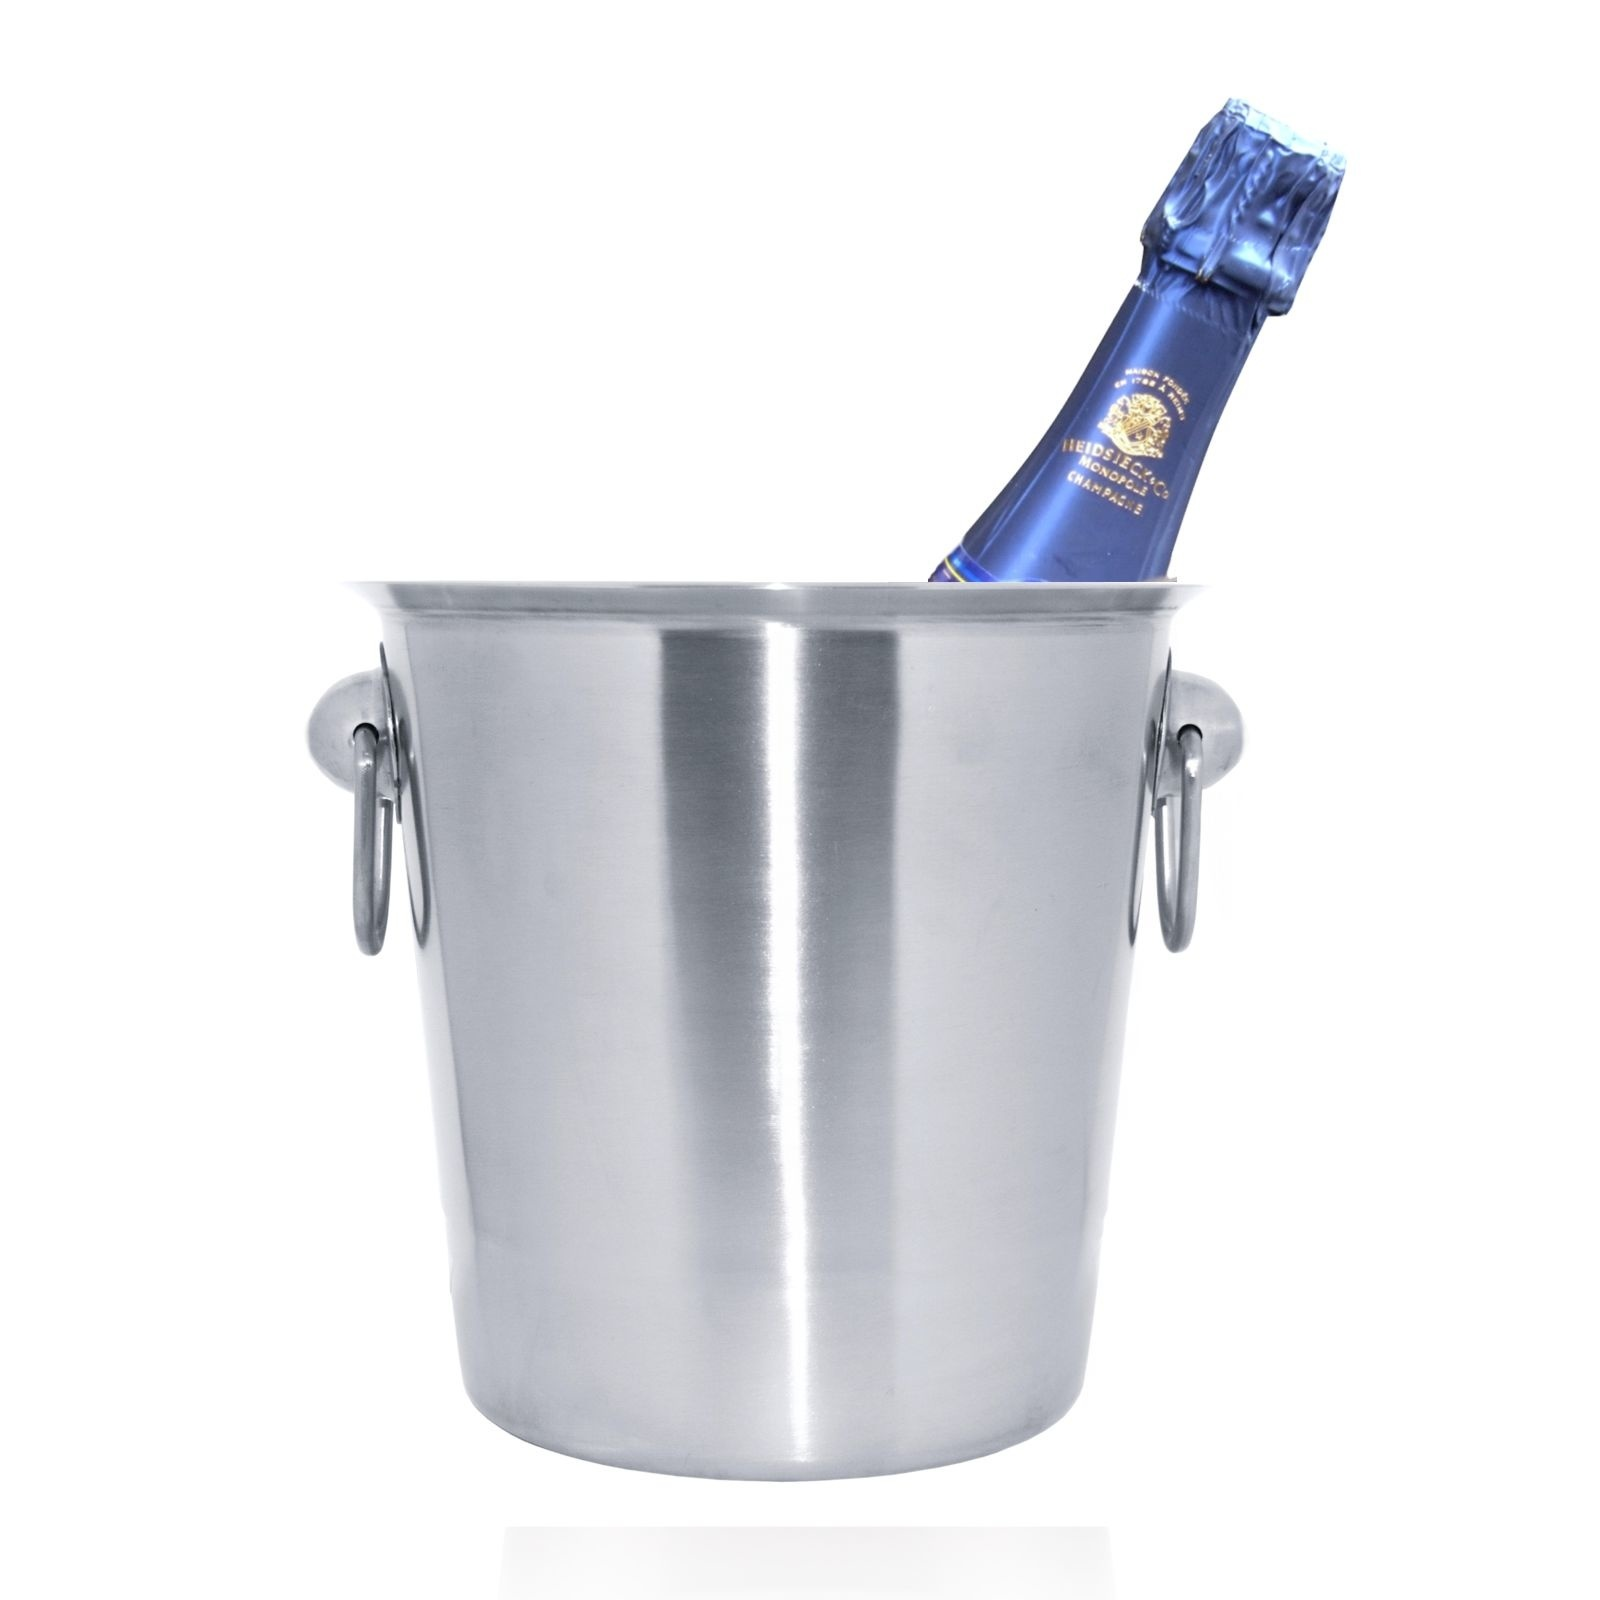 Seau a champagne